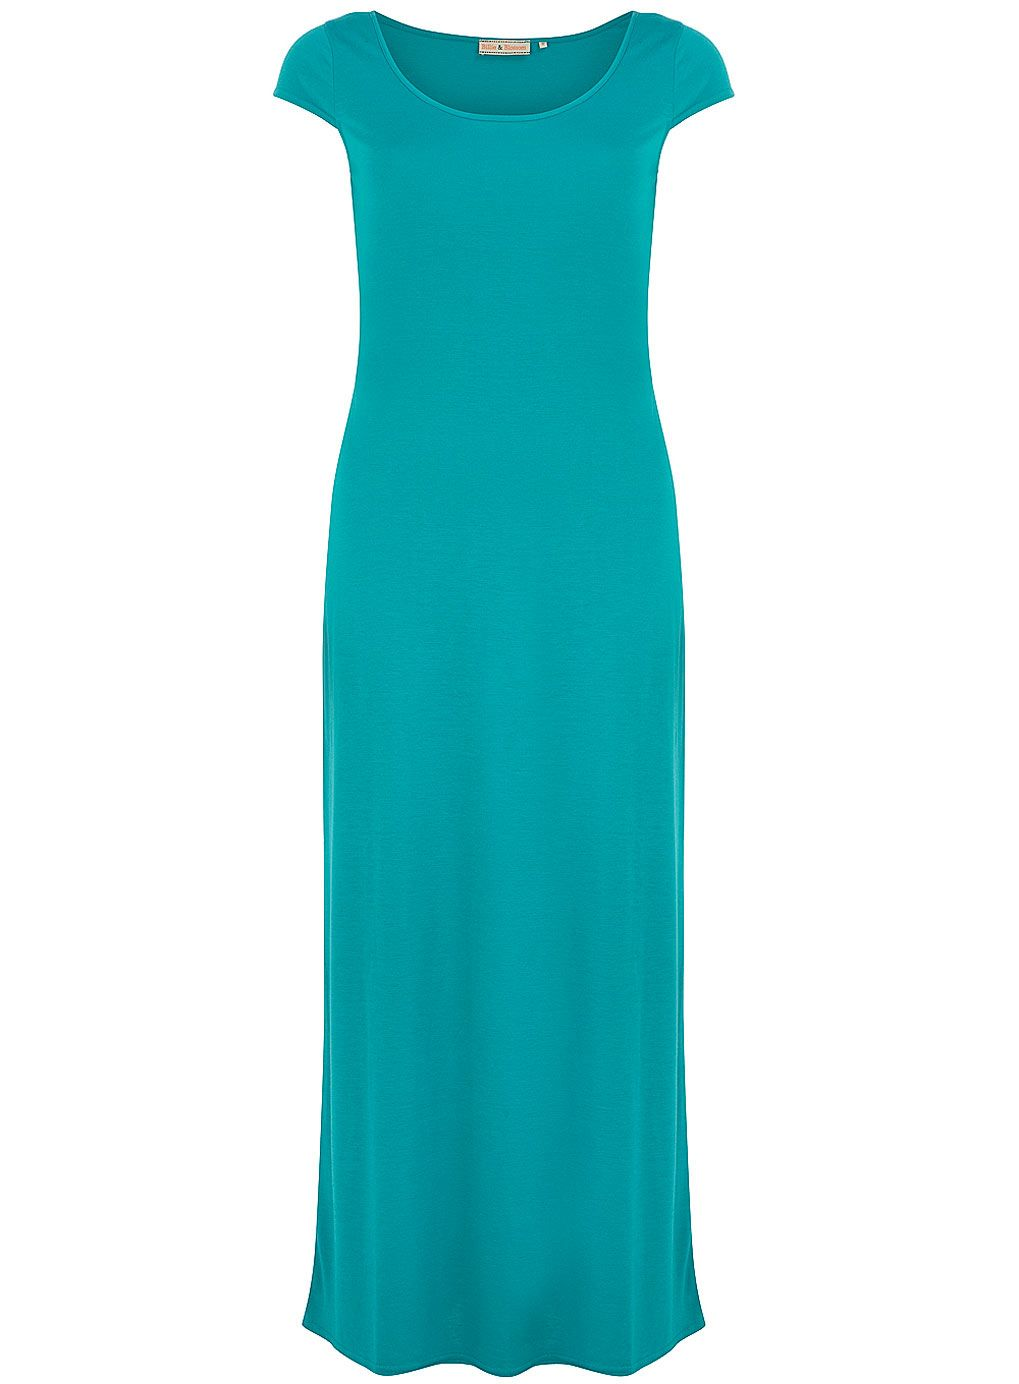 Peacoat short sleeve maxi dress - Dresses Sale - Dresses - Dorothy ...